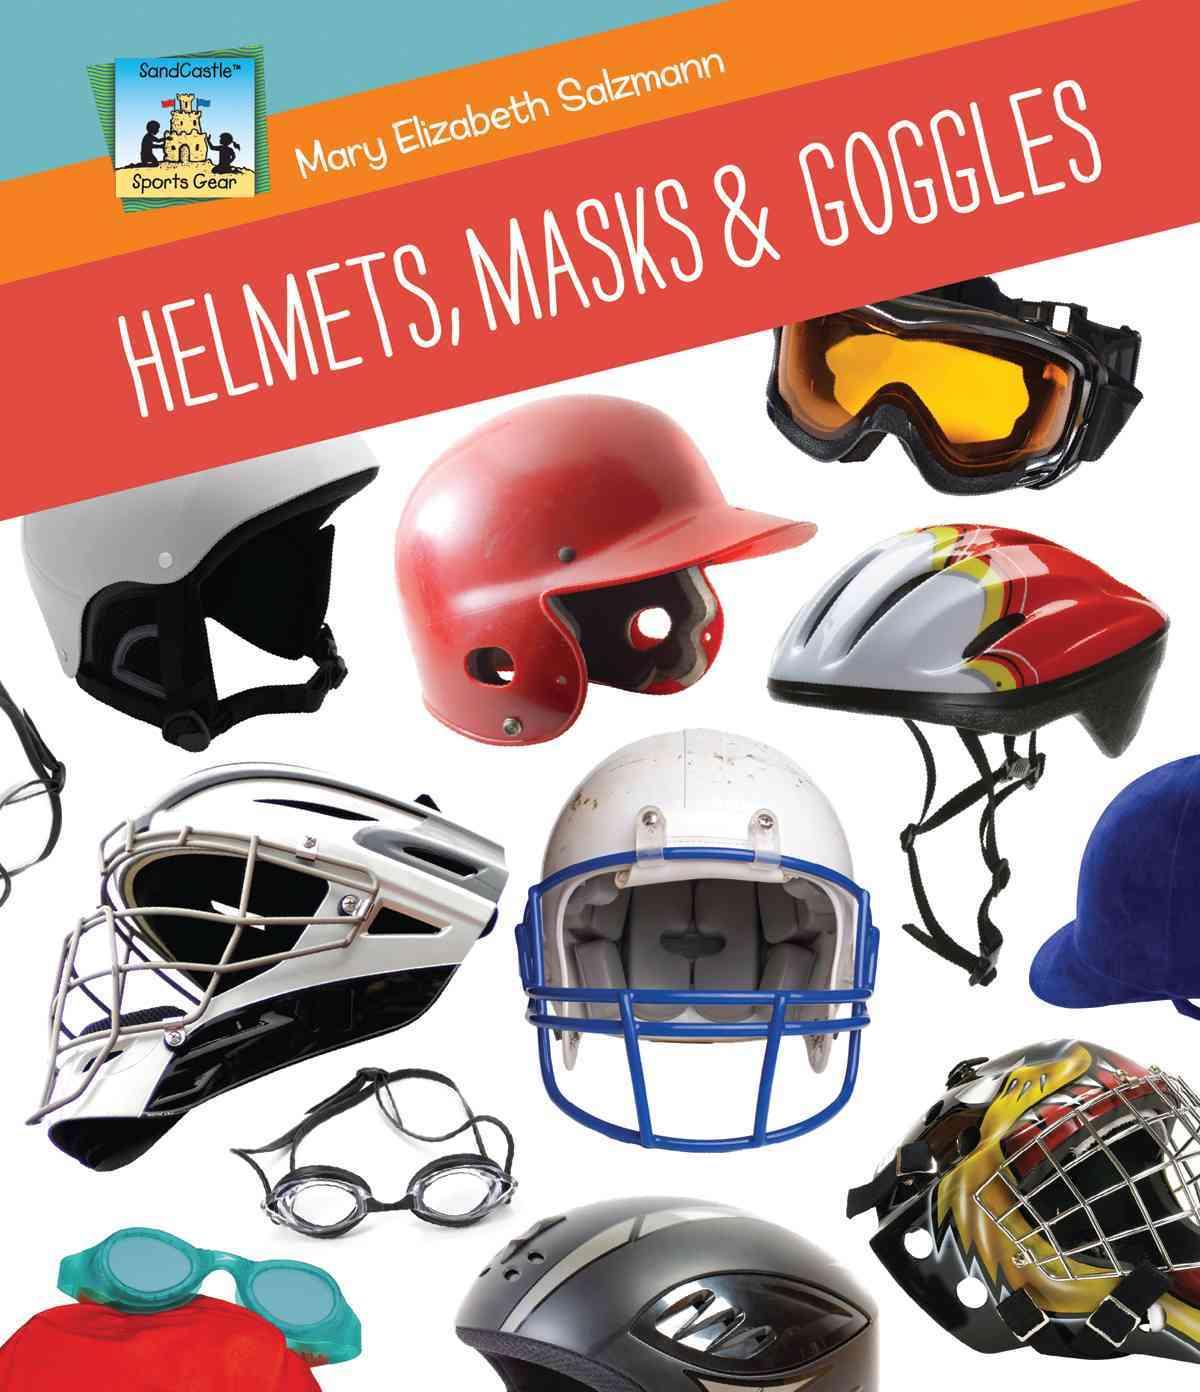 Helmets, Masks & Goggles (Hardcover)